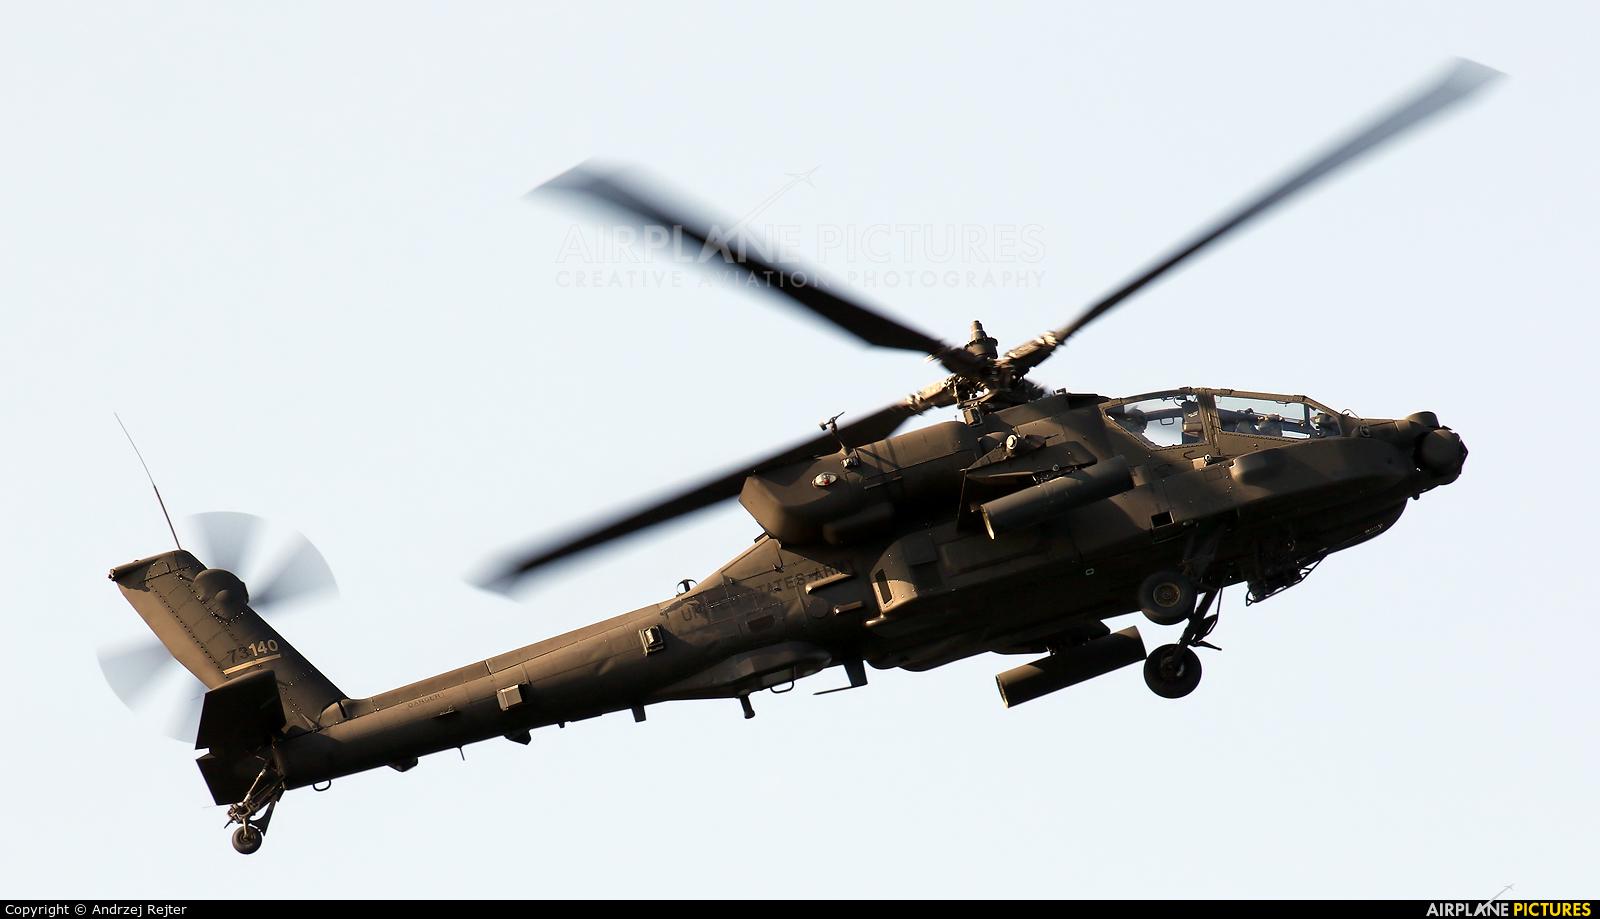 USA - Army 17-03140 aircraft at Giżycko